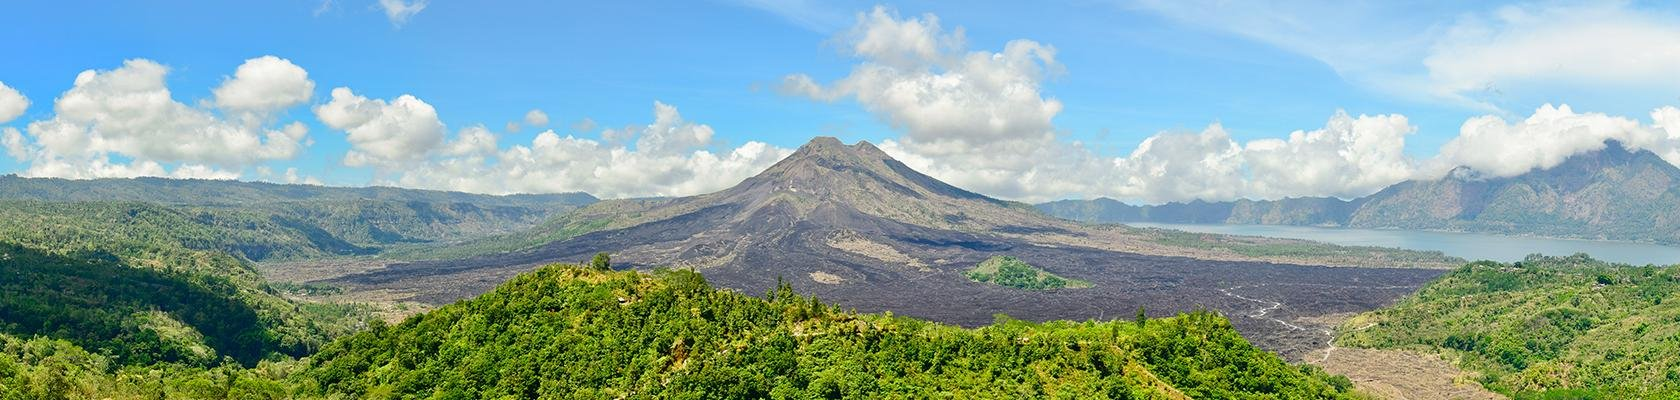 Indonesië - Bali - Batur-vulkaan